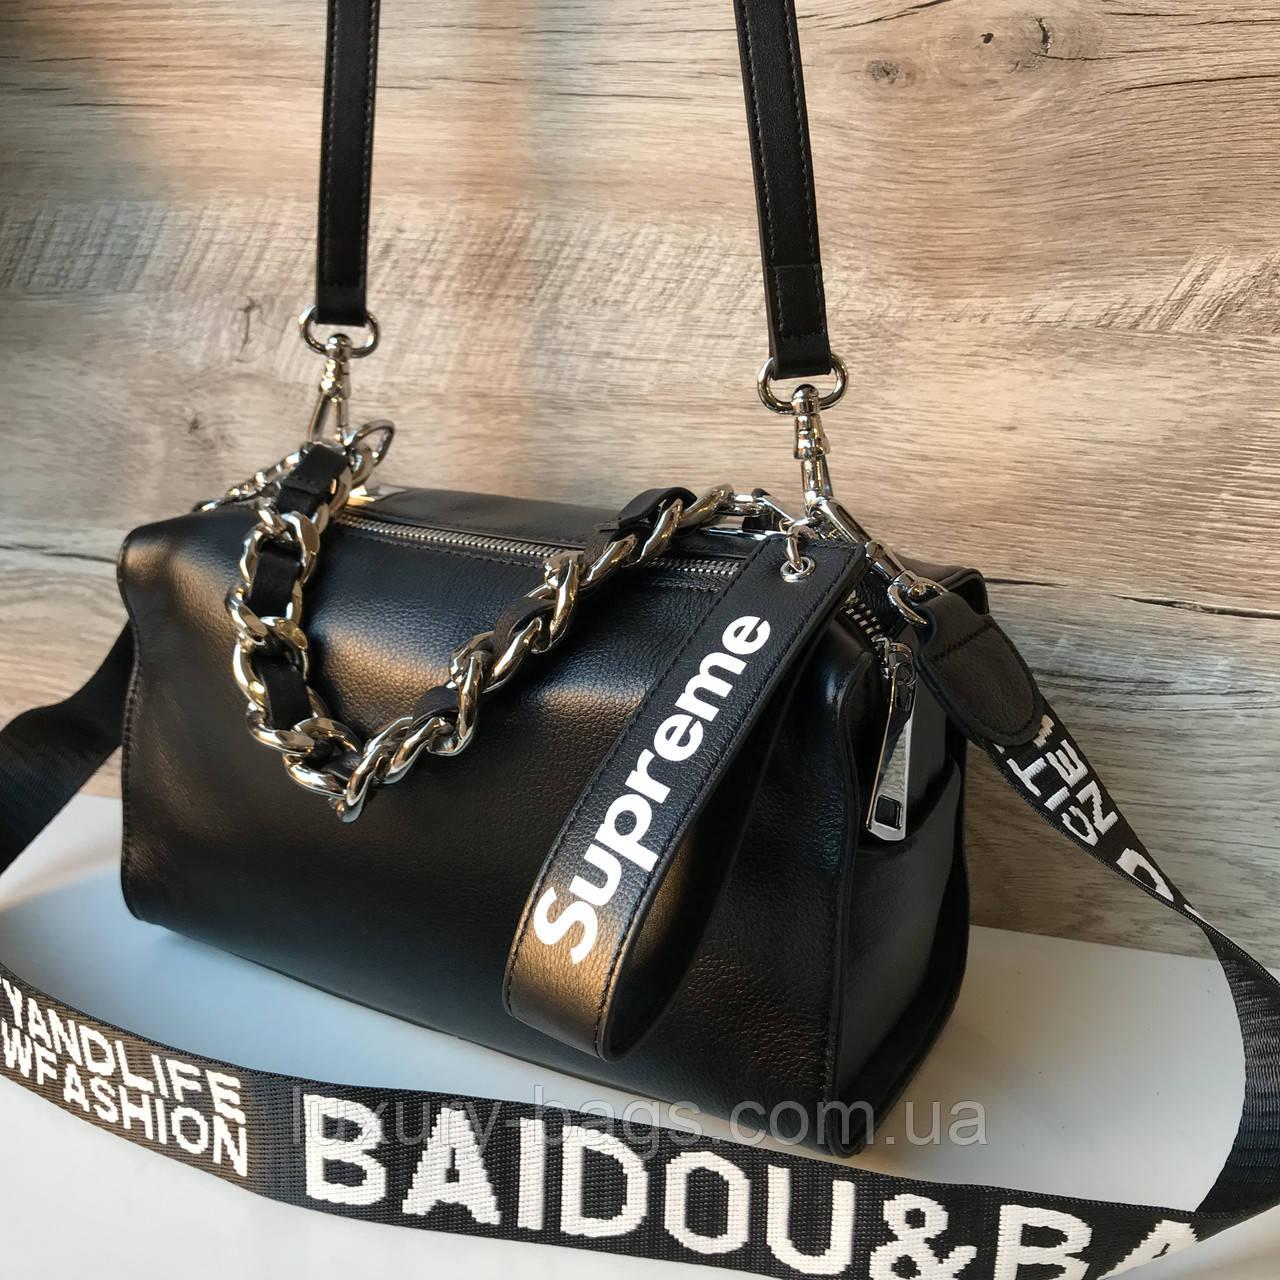 2a4a21defc20 Кожаная сумка Supreme, цена 1 464 грн., купить в Одессе — Prom.ua  (ID#638642188)